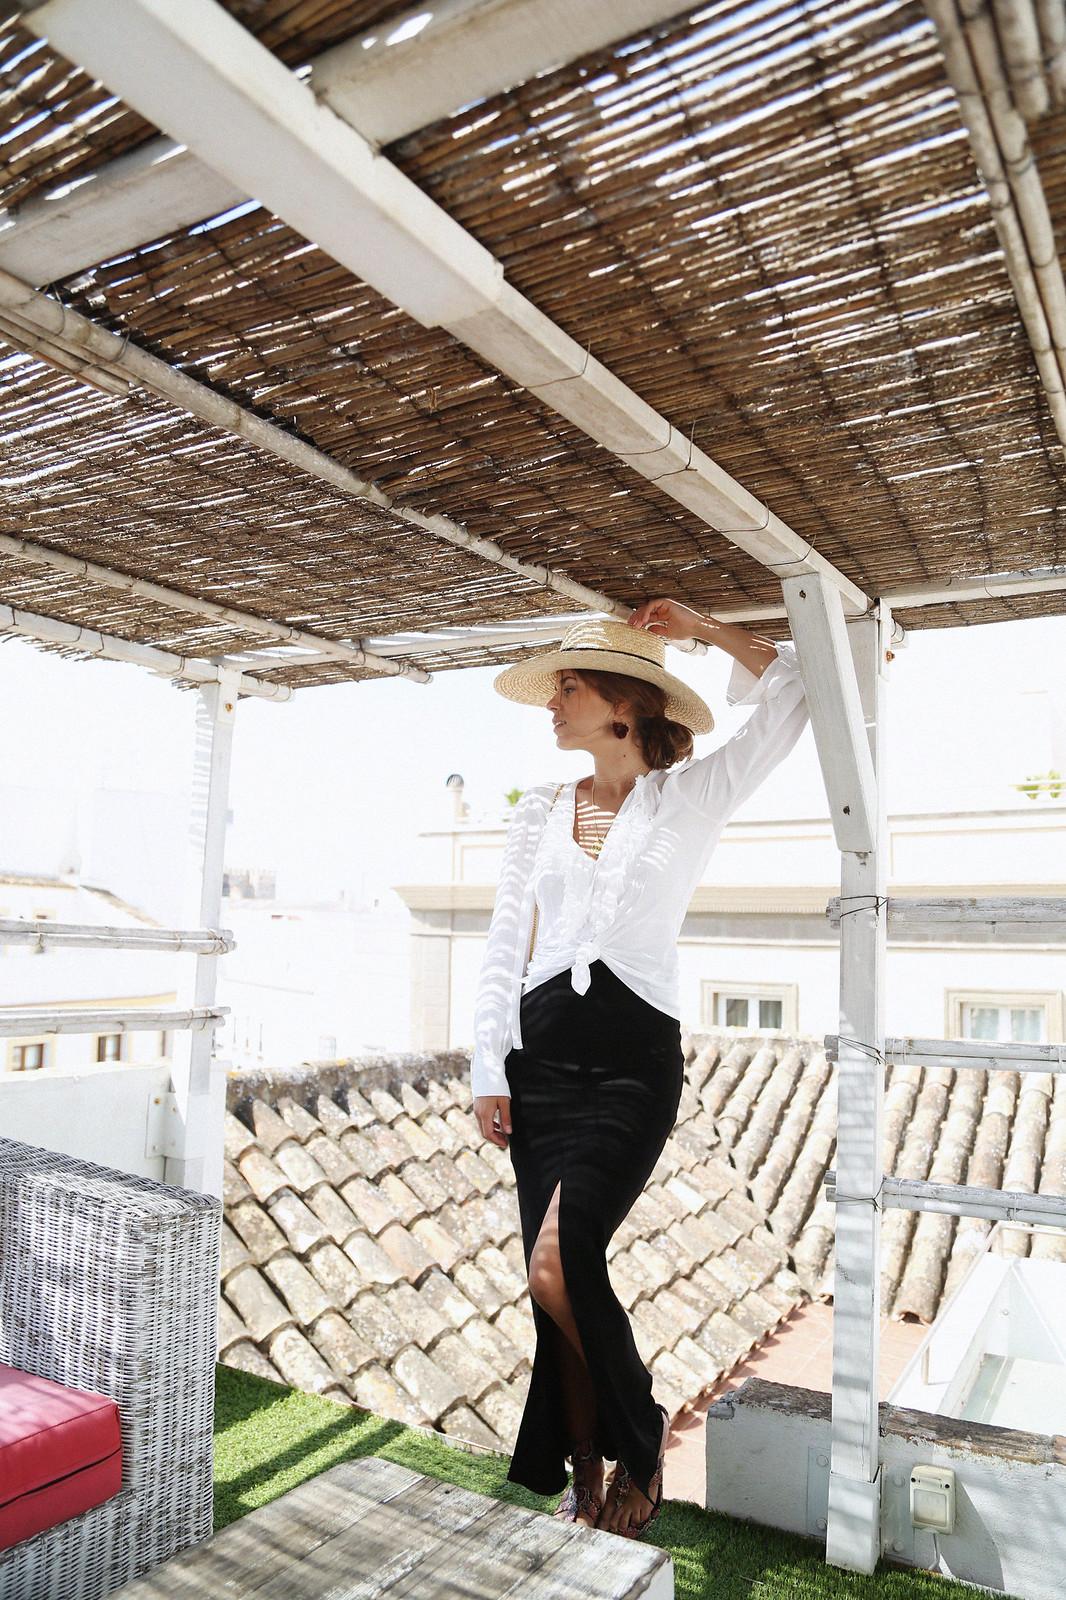 Jessie Chanes Seams for a Desire Tarifa Rooftop-11